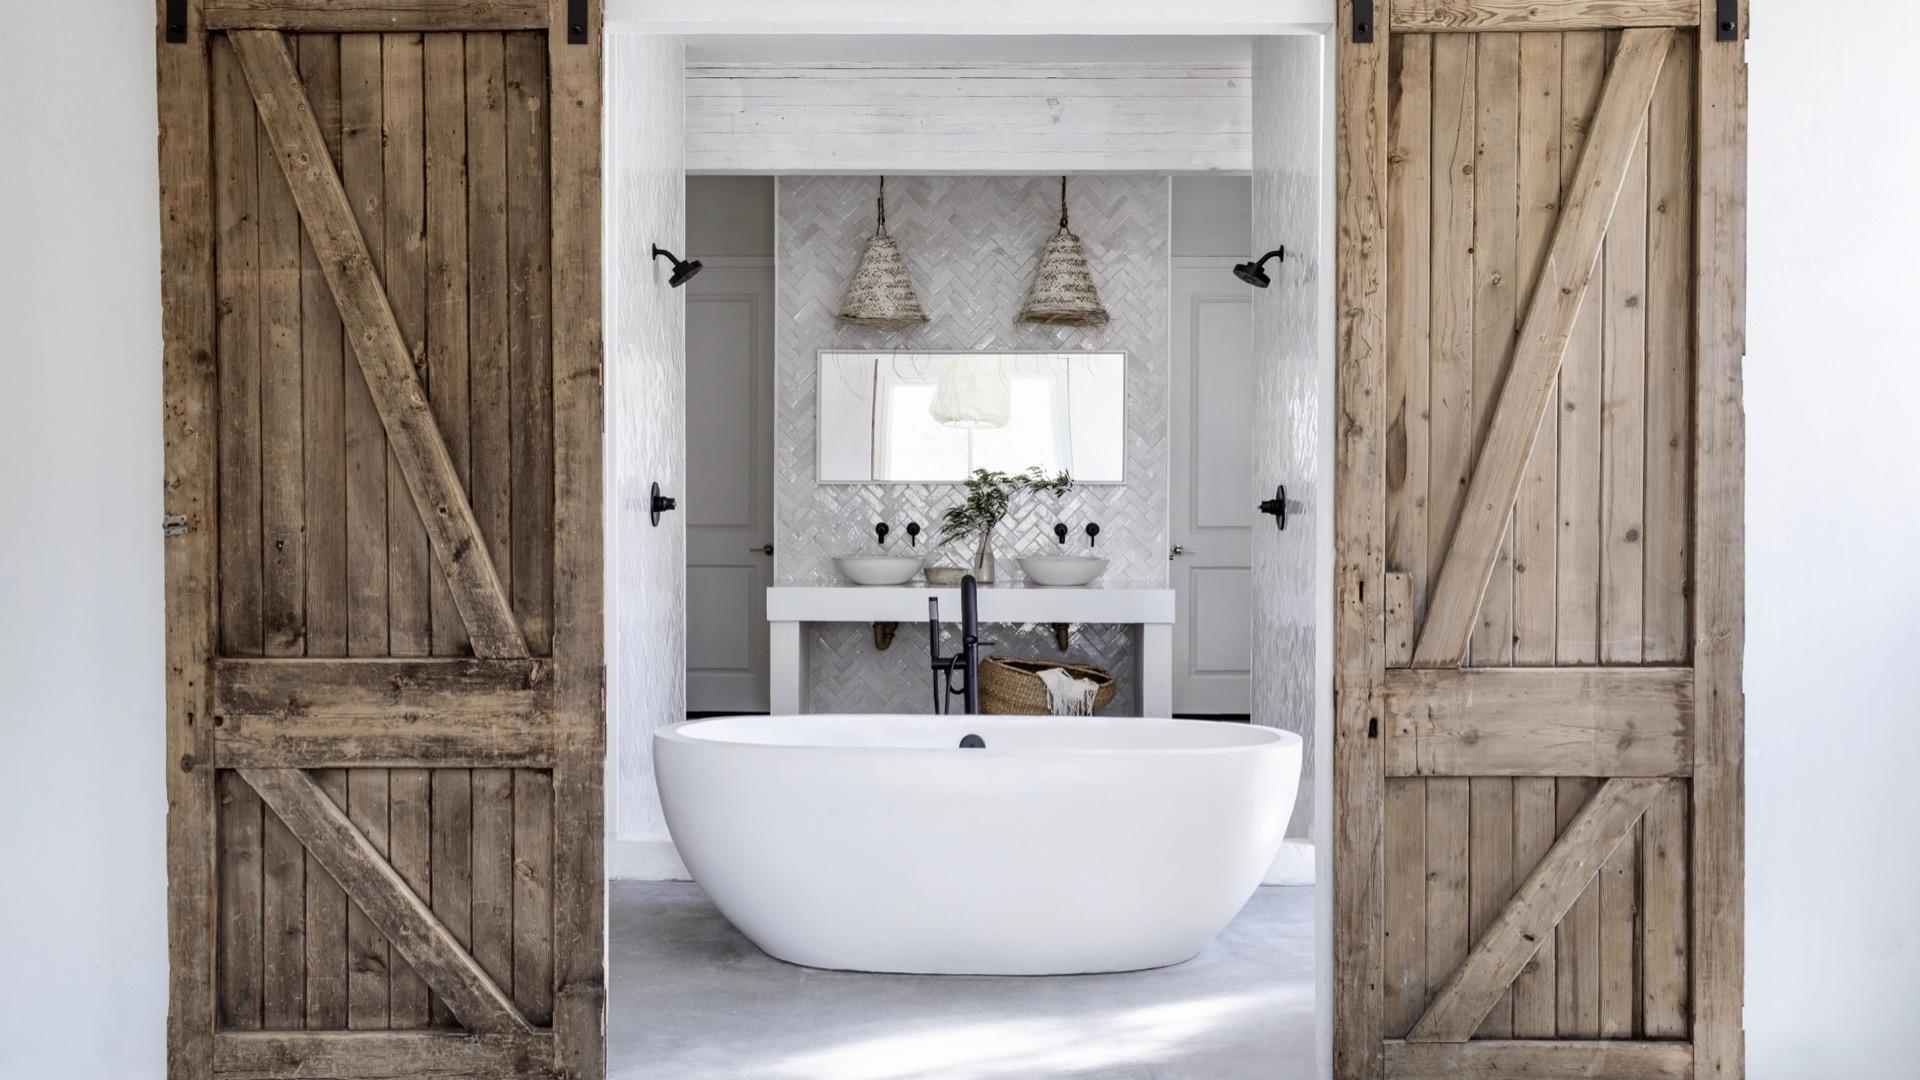 Leanne Ford's Chic White Bathroom Design, Healthy Living + Travel